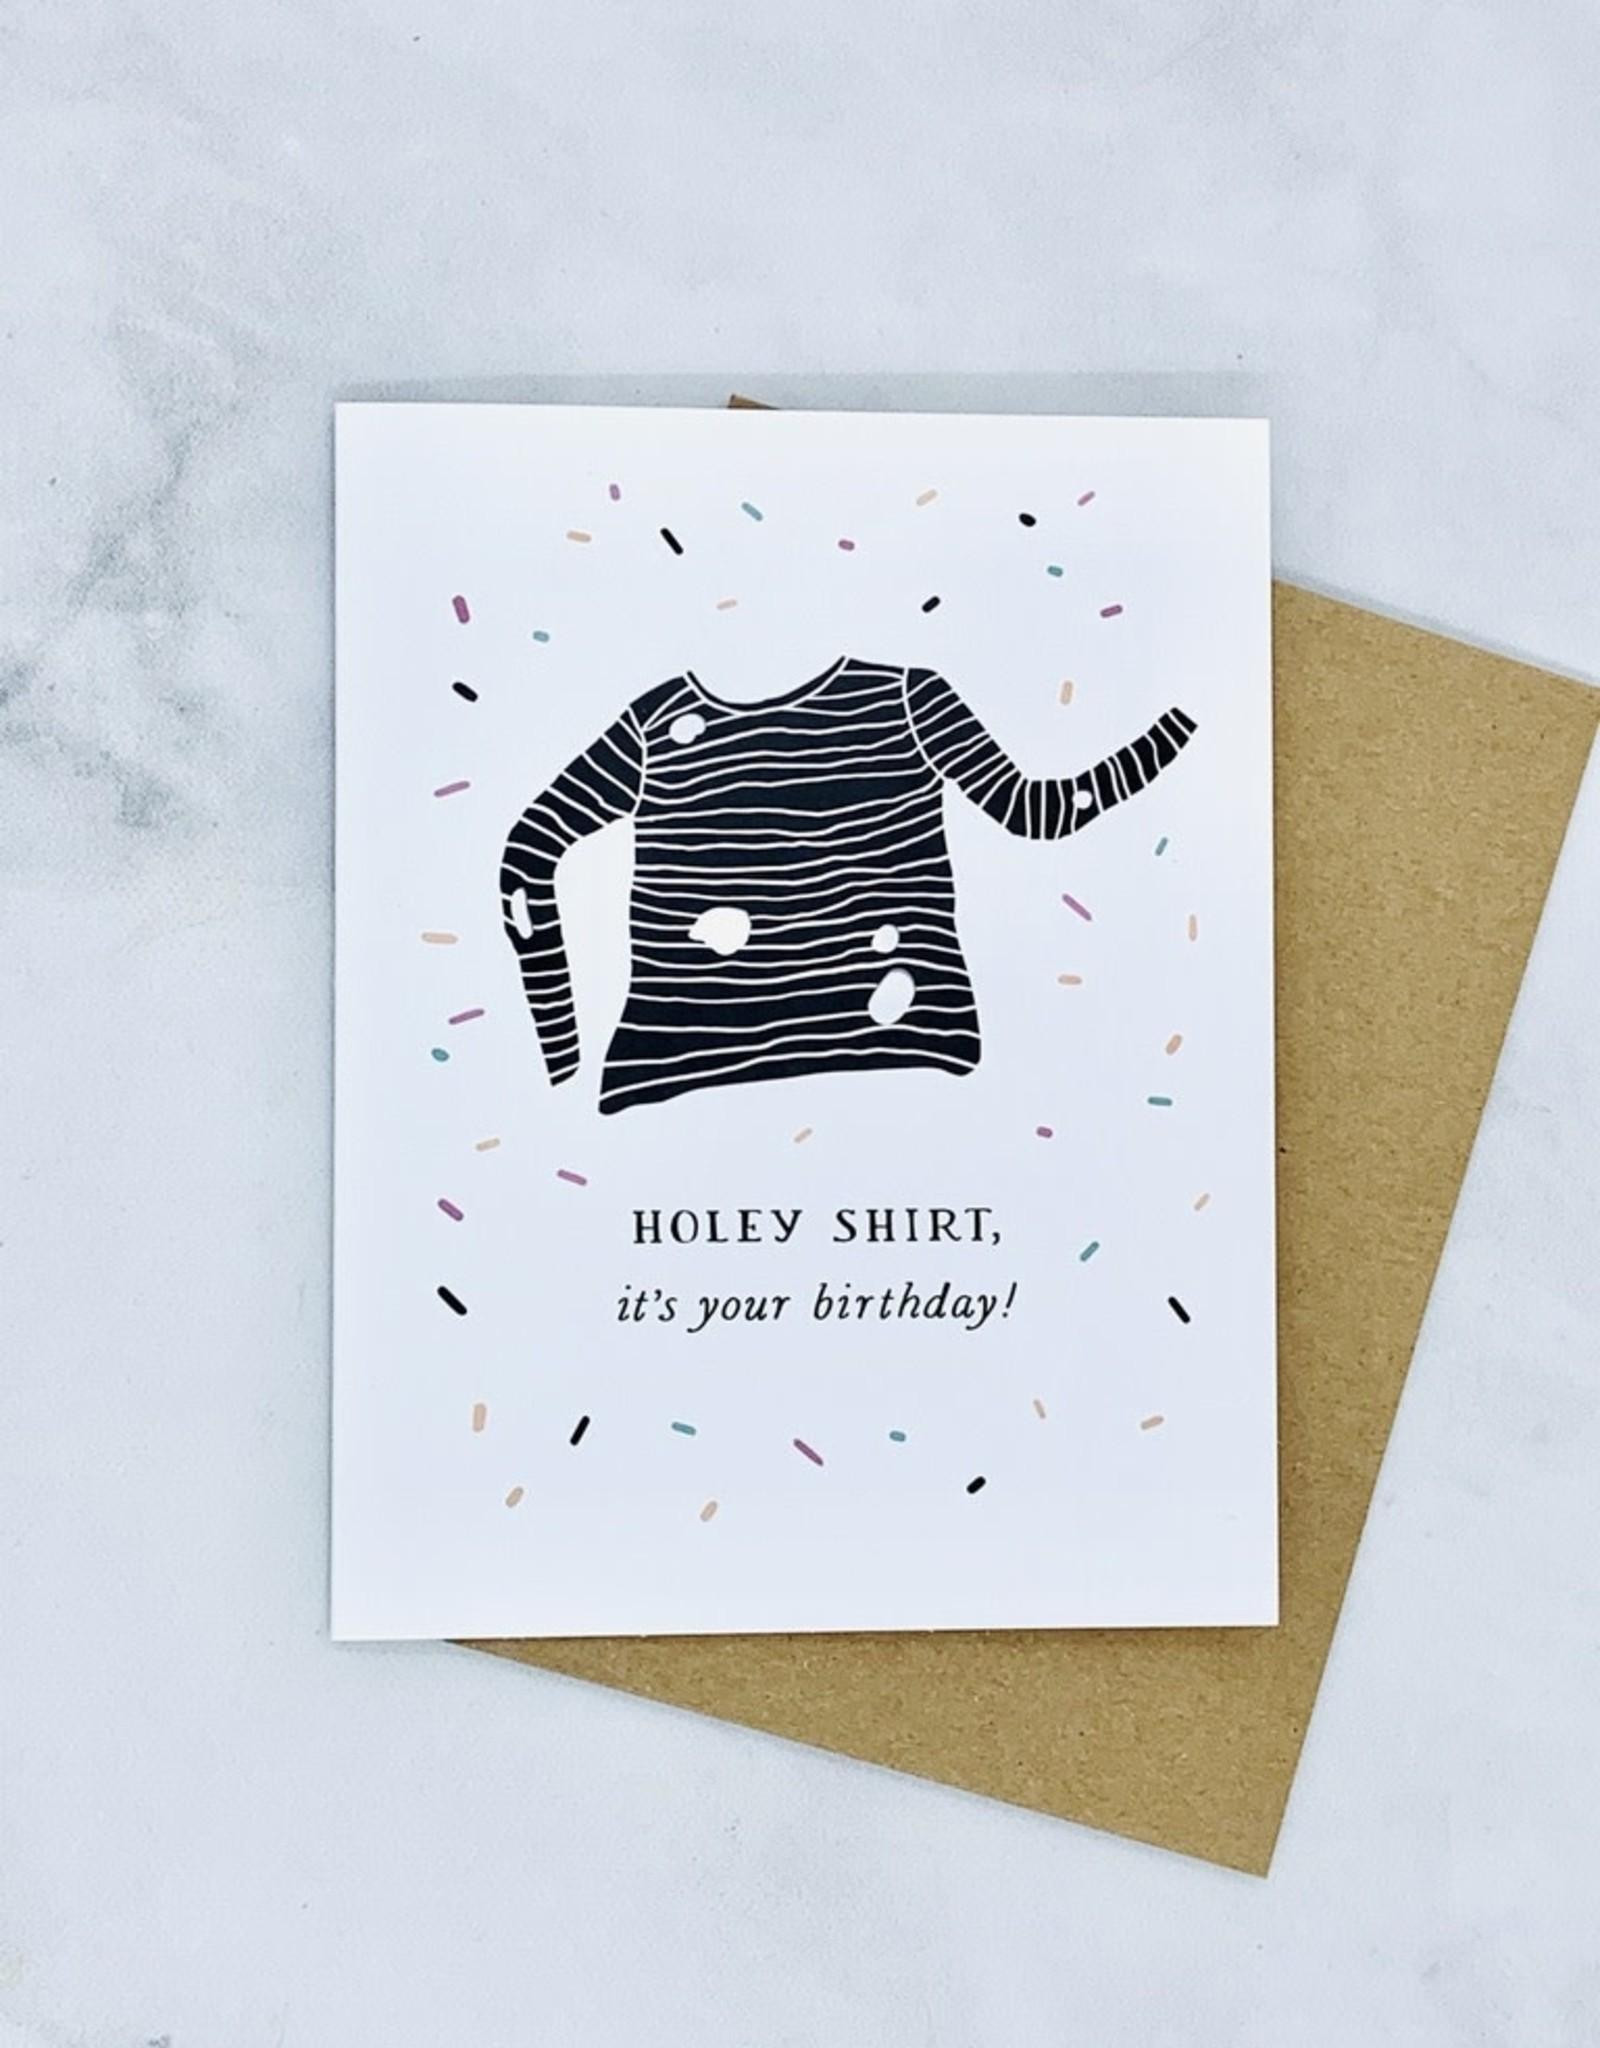 Holey Shirt Birthday Card